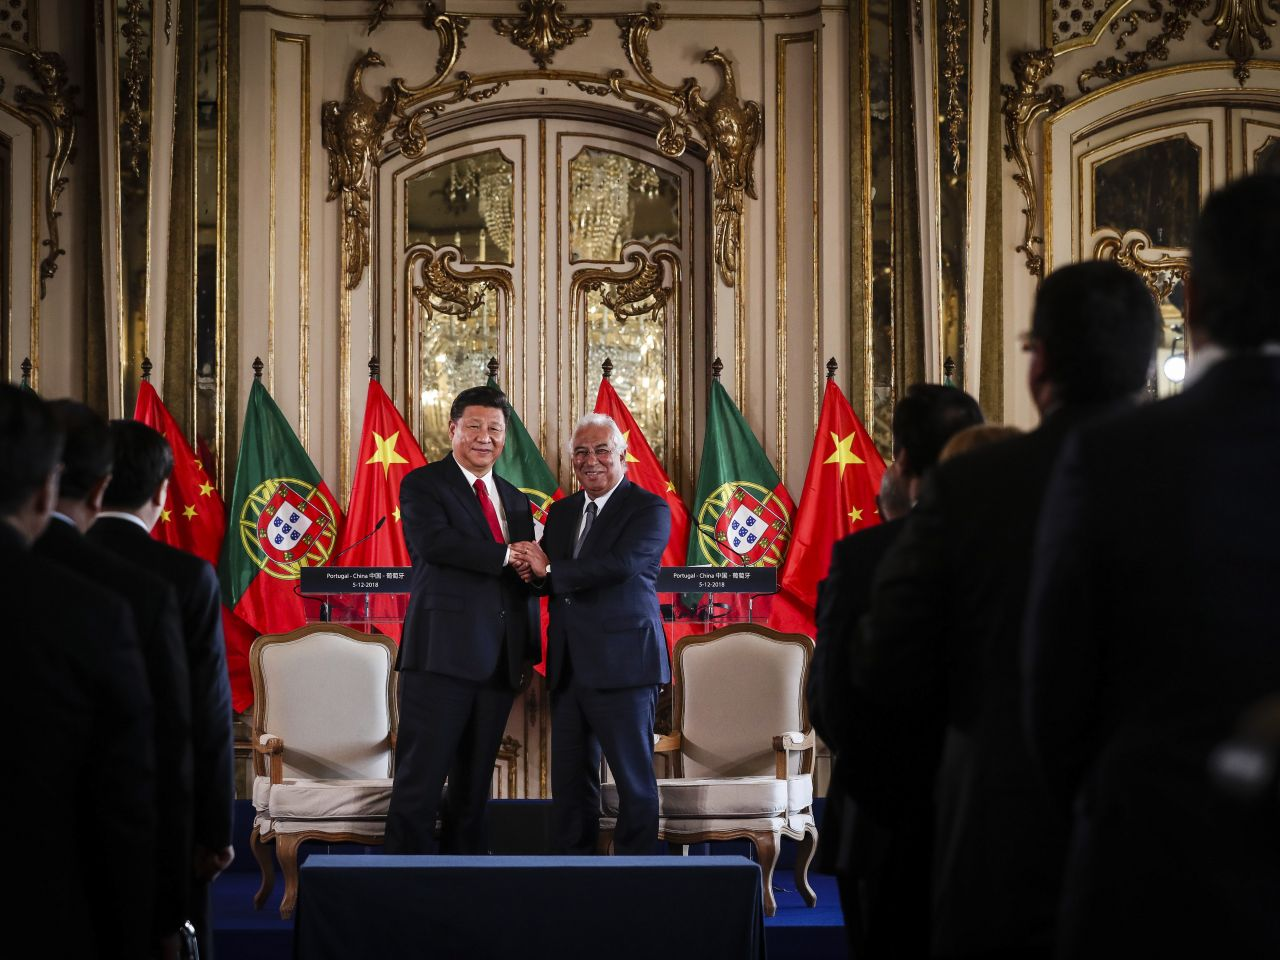 Macau News